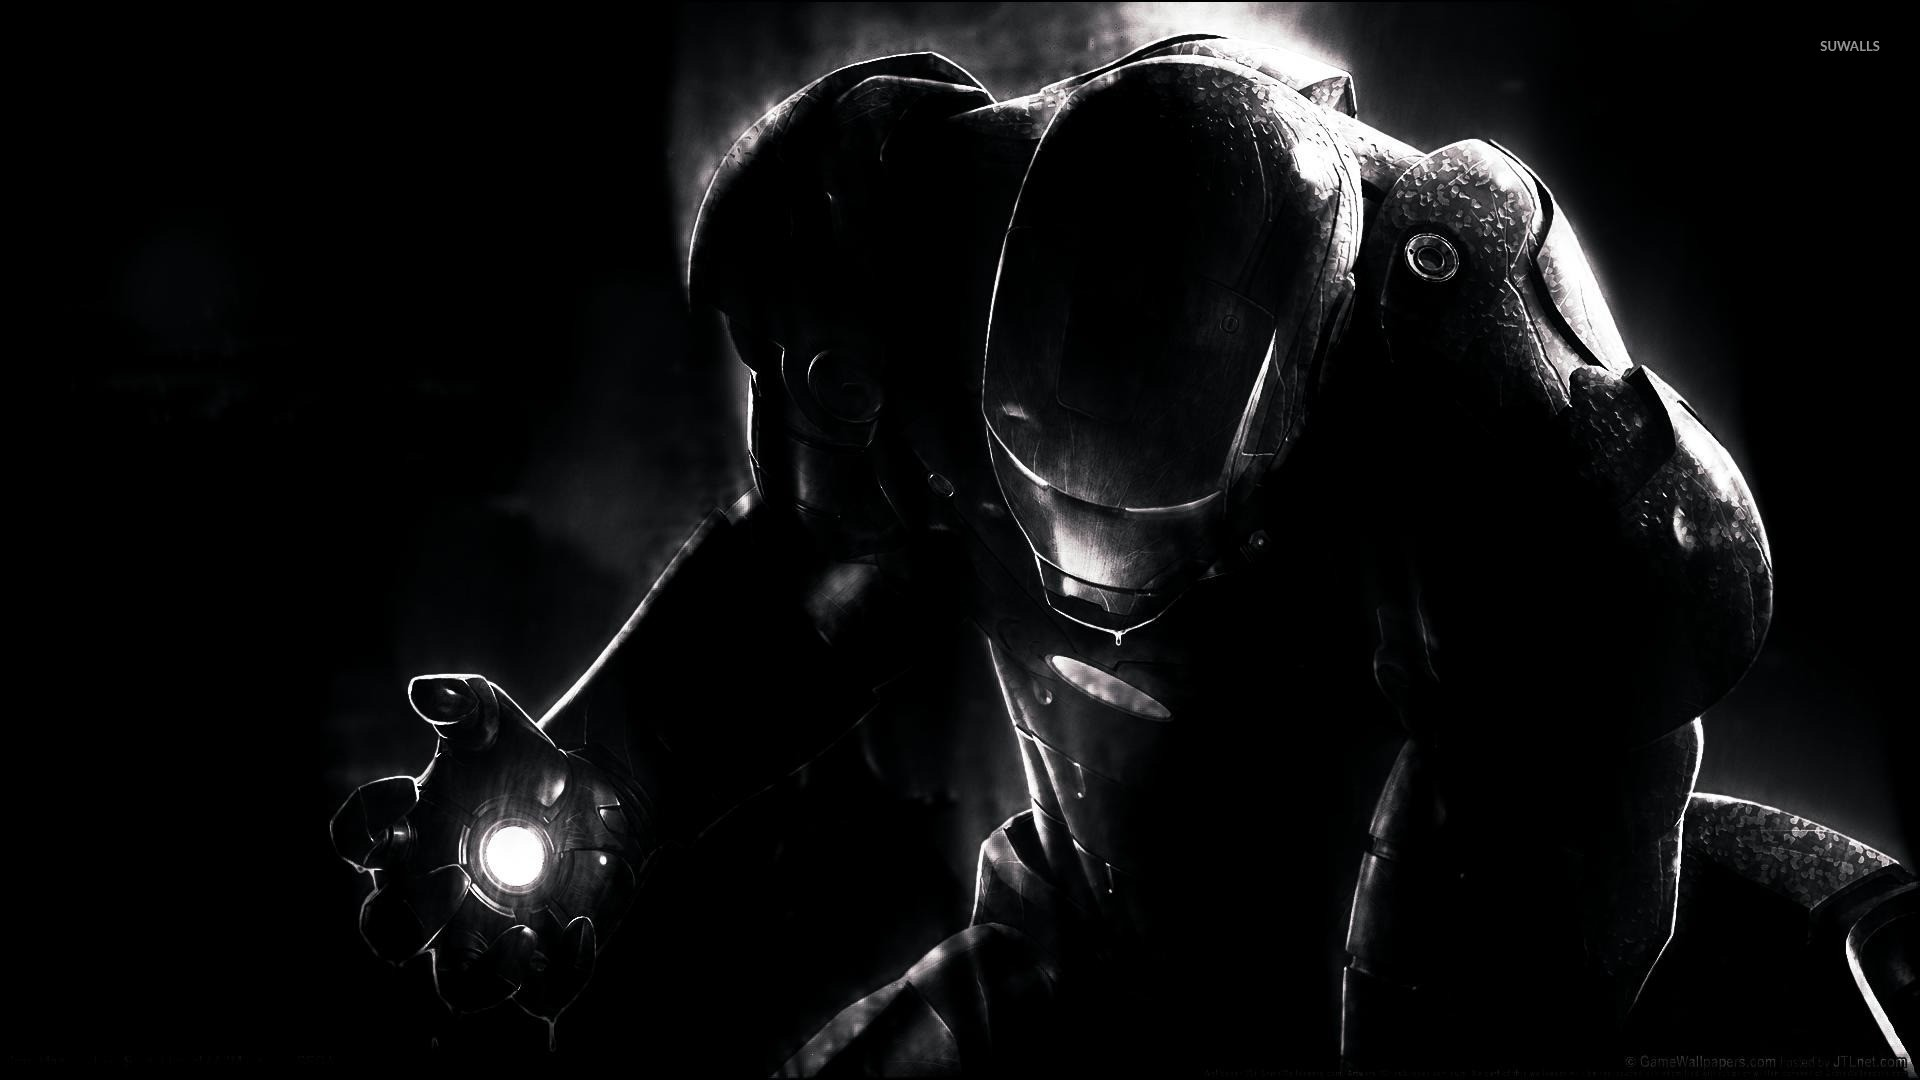 The Avengers 2012 – Hulk, Captain America, Iron Man and Thor .